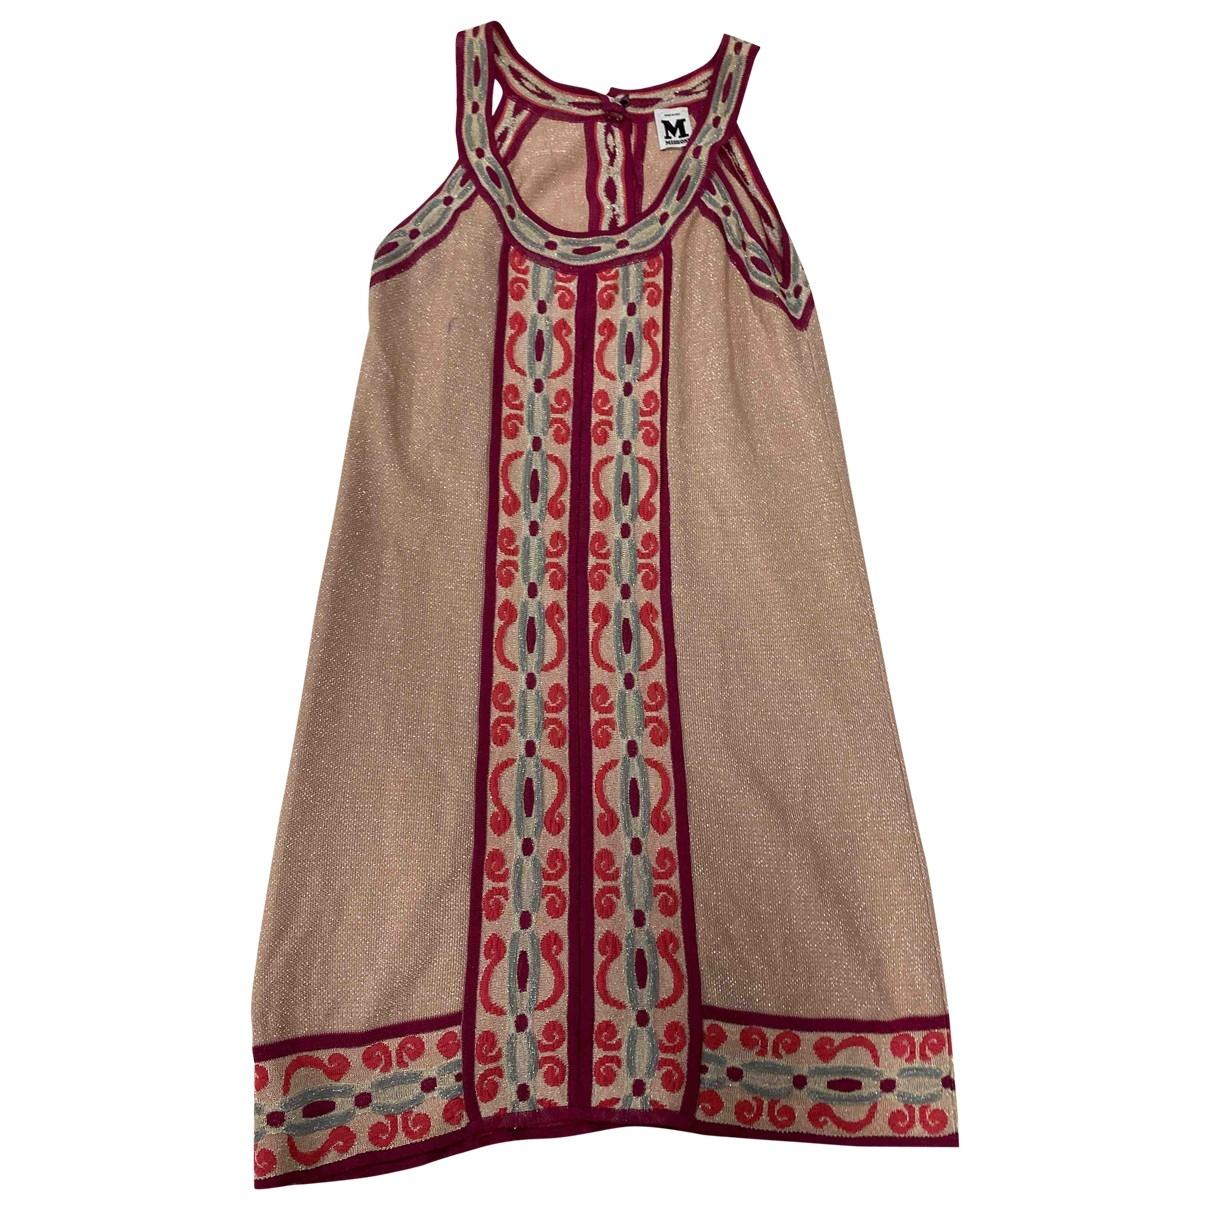 M Missoni \N dress for Women 38 IT